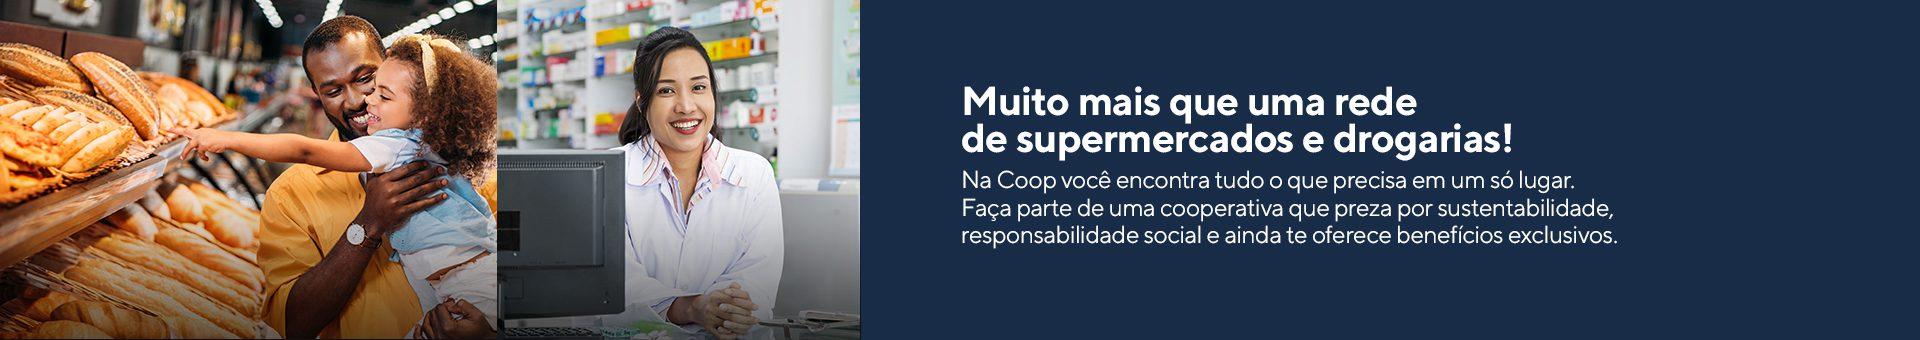 160723_20_COOP_REVITALIZACAO_MATERIAIS_NOVA_MARCA_ATUALIZACAO_BANNER-SITE_1920x340_COOPERADO